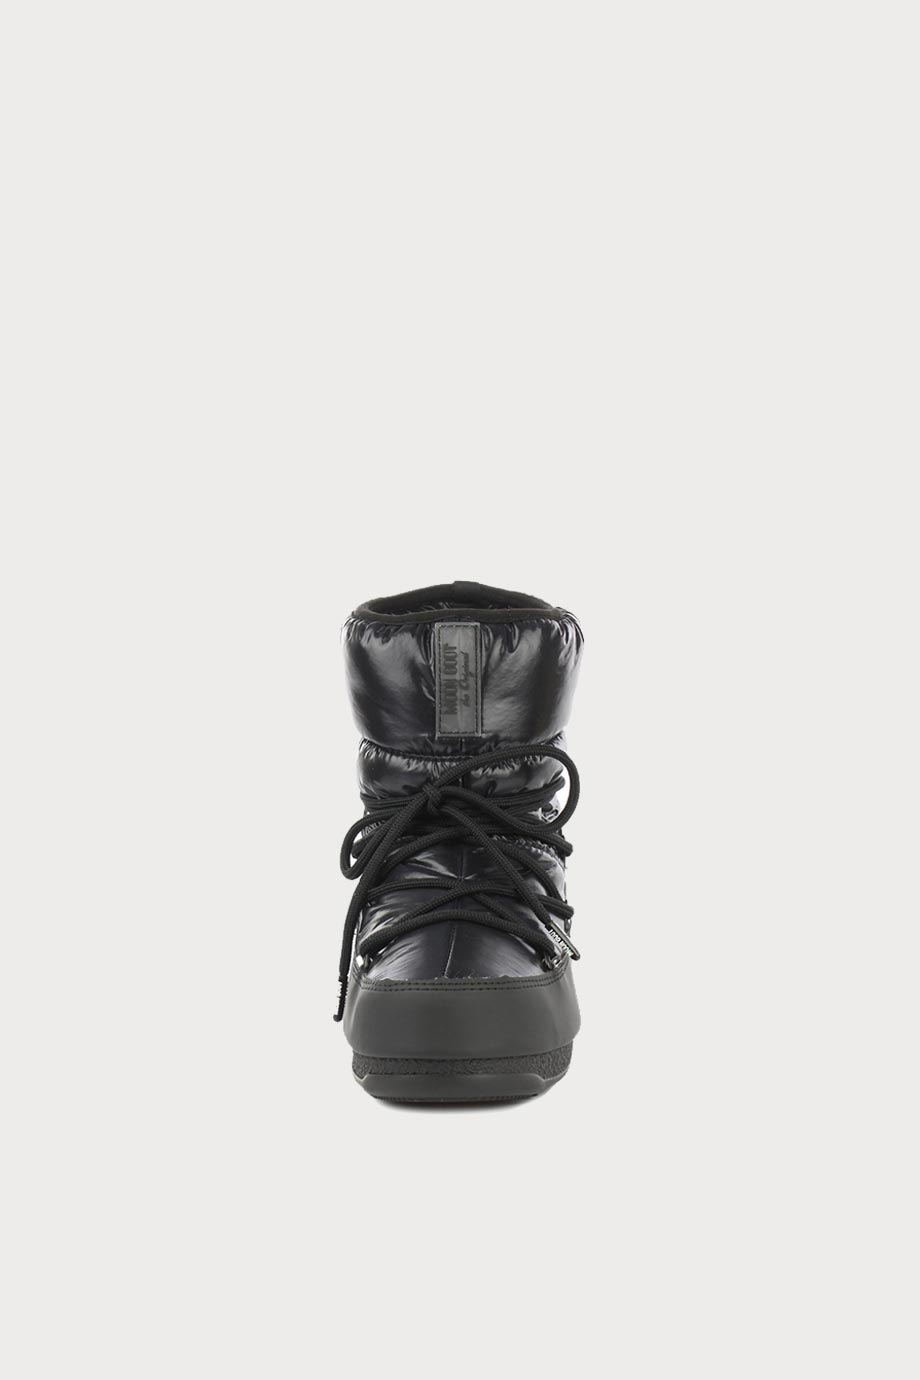 spiridoula metheniti shoes xalkida p 24009800 001 black low laces MoonBoot 5